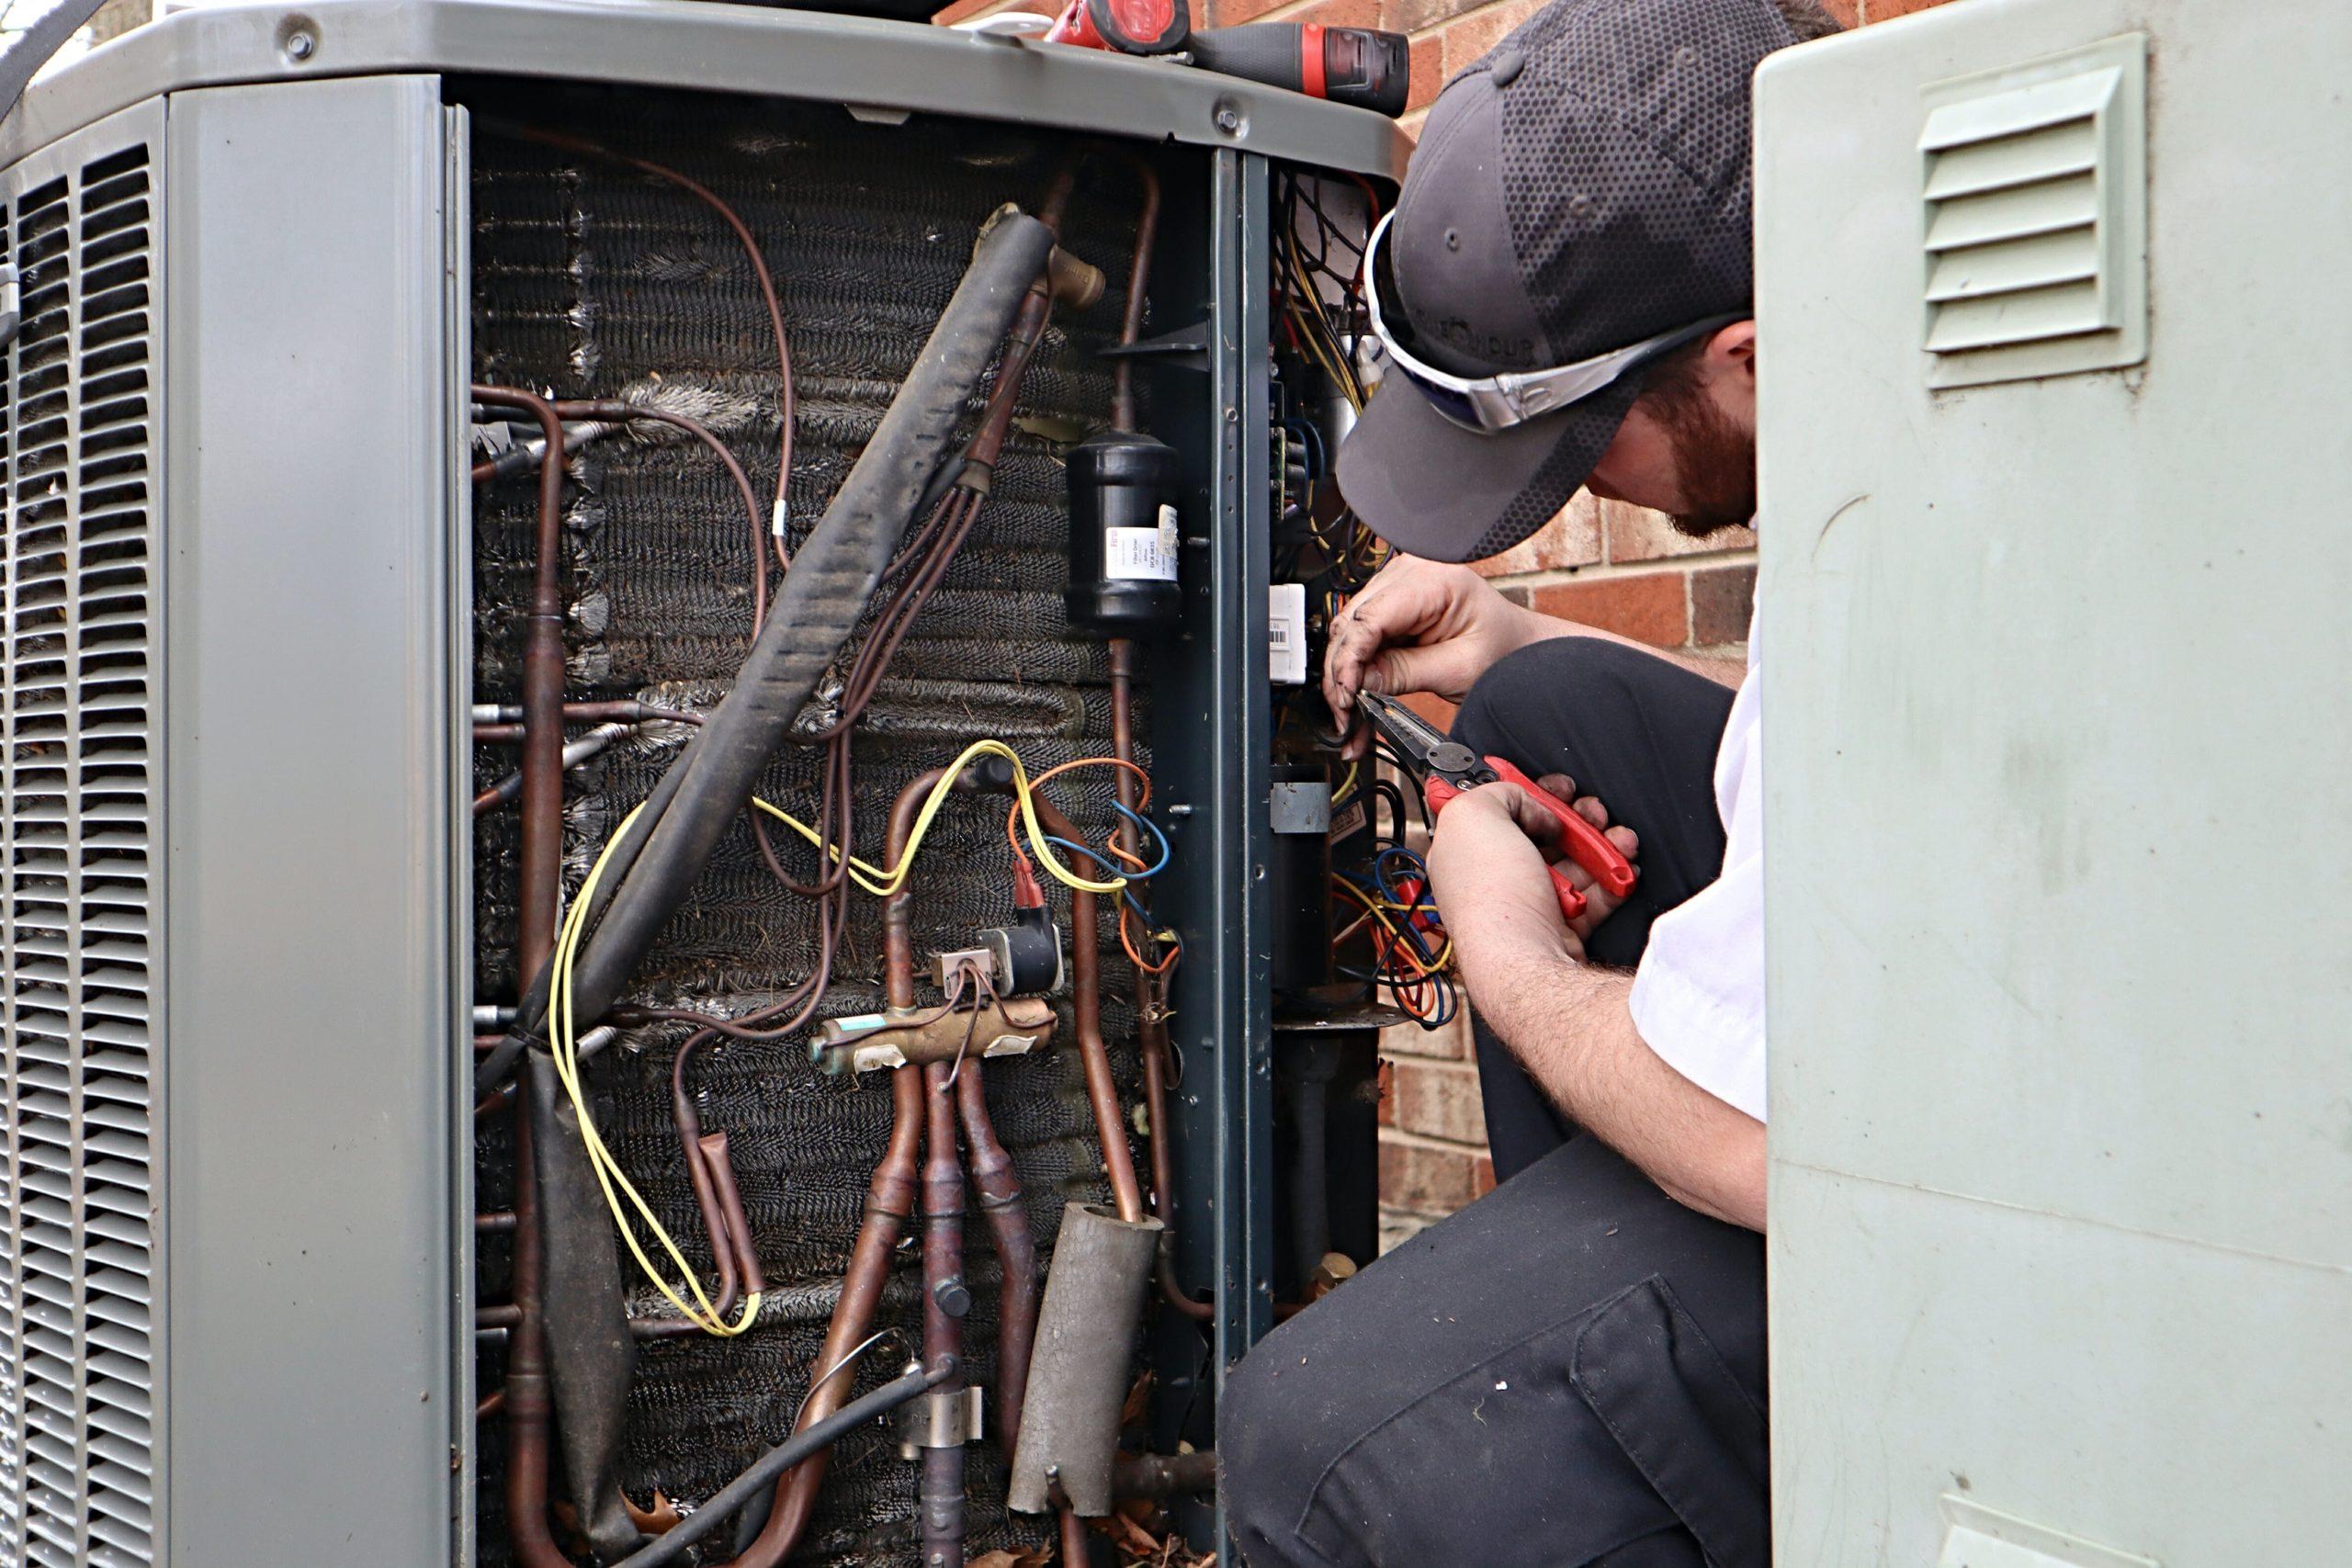 AC Repairs at Ashworth Heating and Cooling in WV